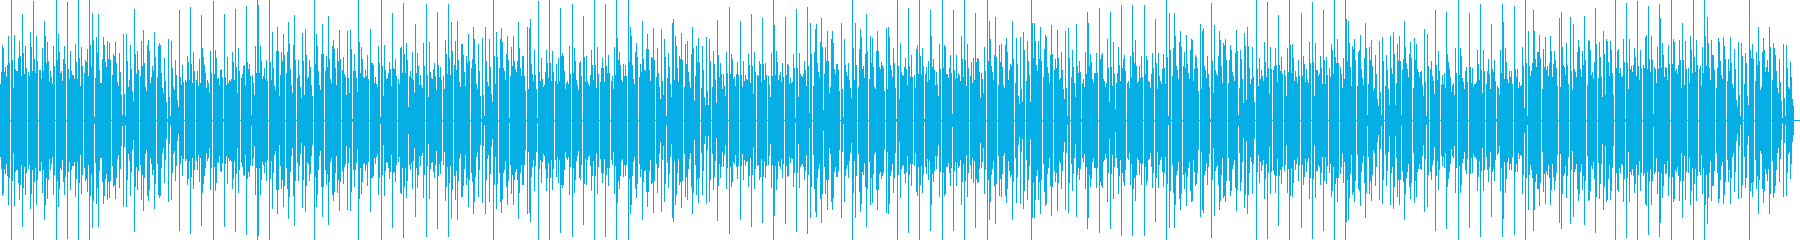 8bit ゲーム内音楽 チップチューン1の再生済みの波形